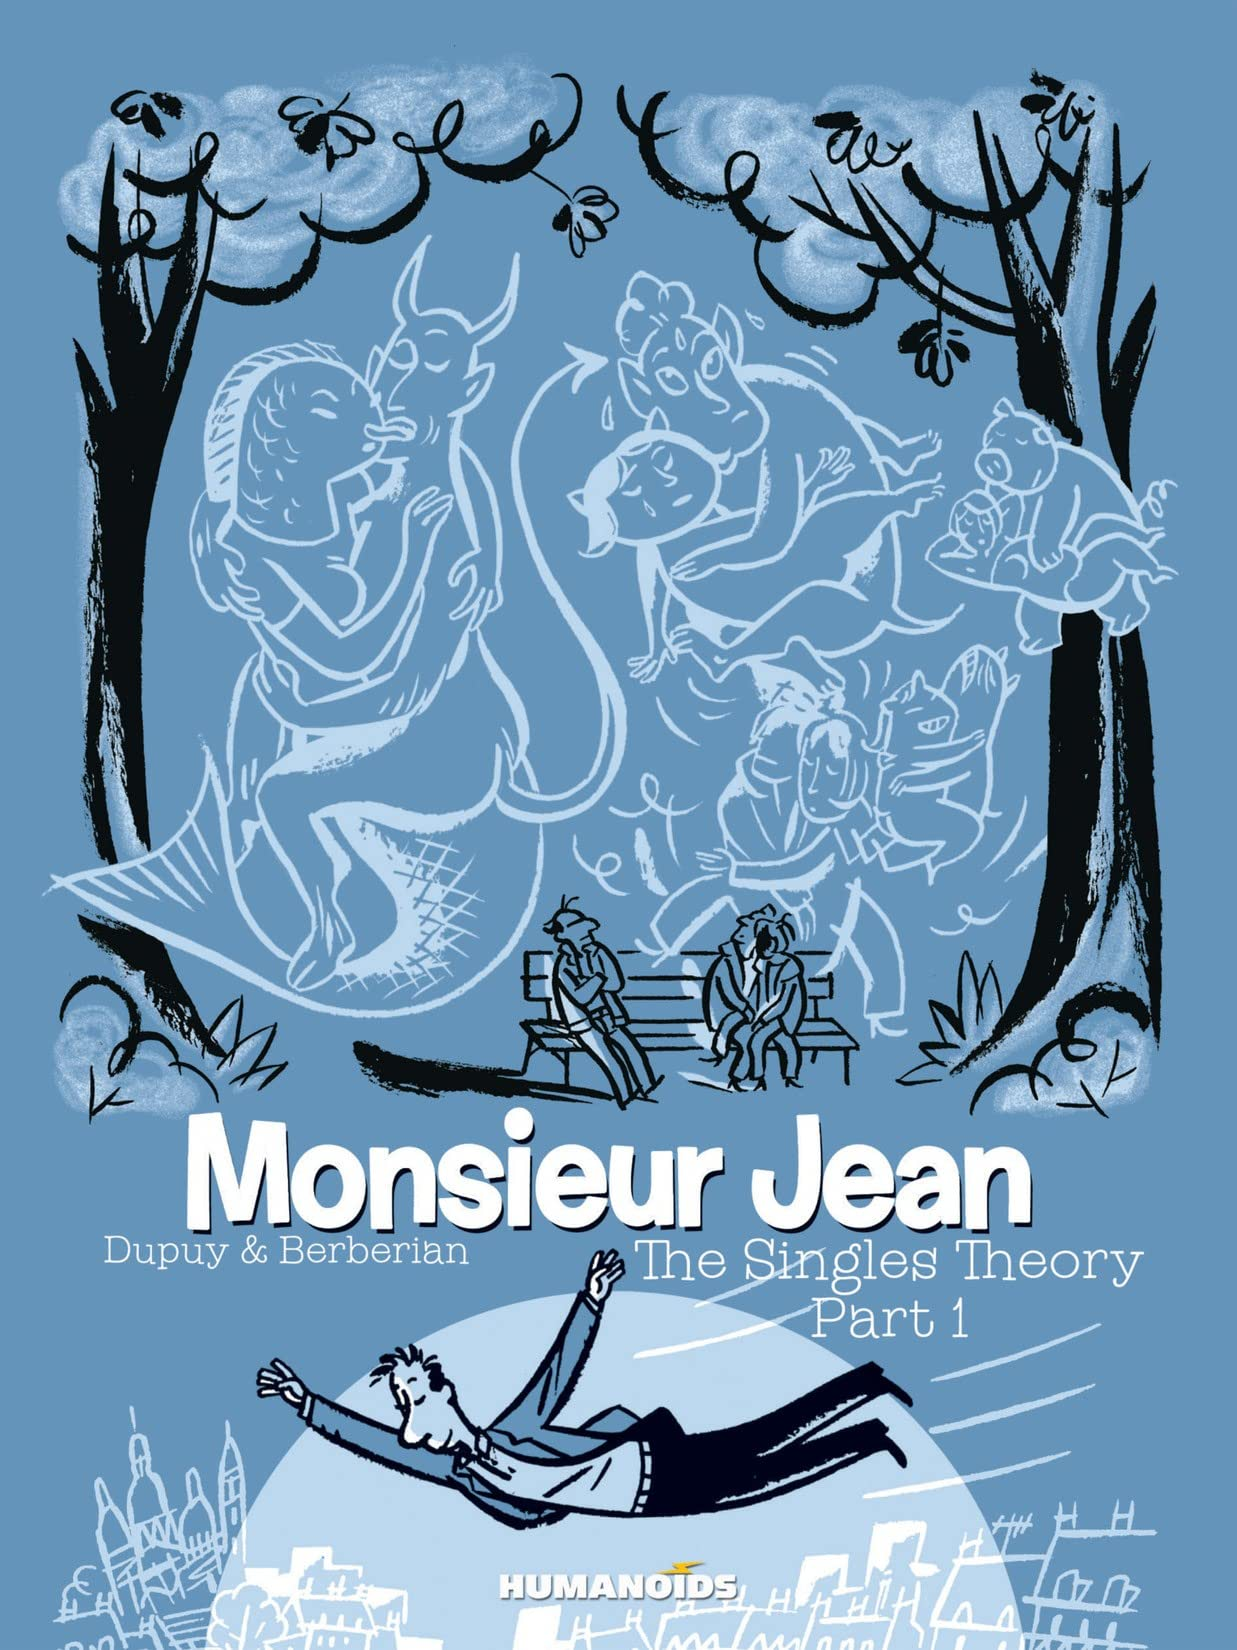 Monsieur Jean Vol. 1: The Singles Theory